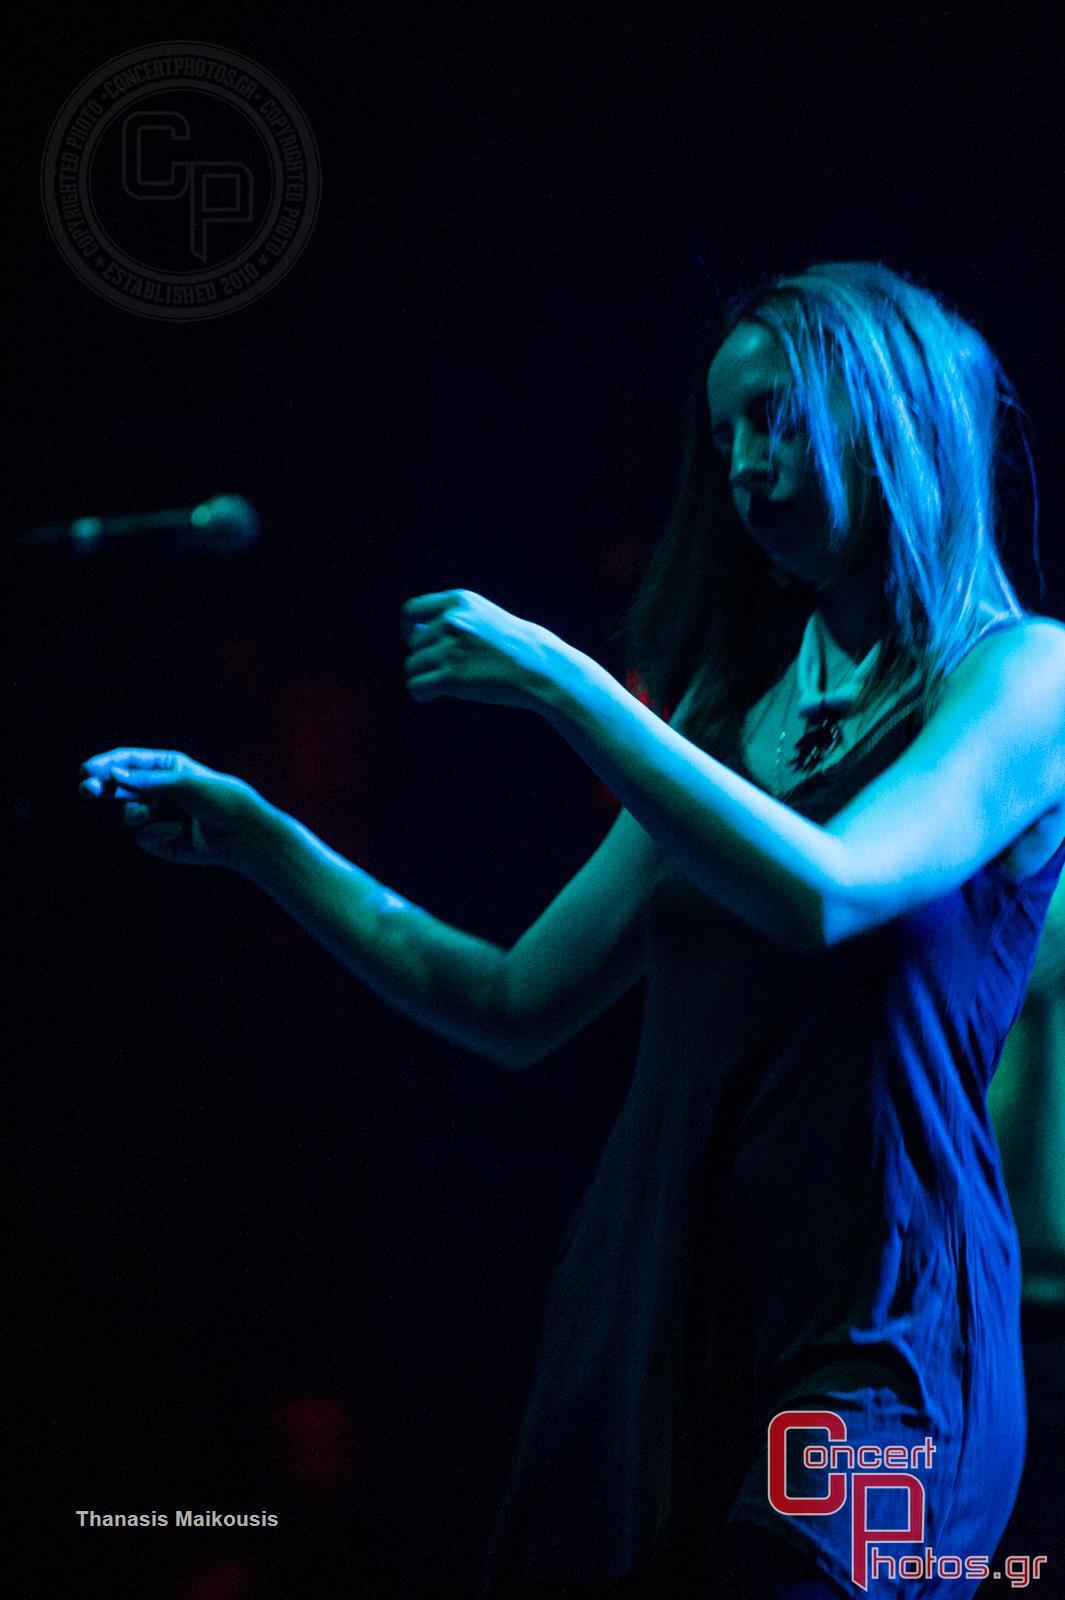 Tricky - Spectralfire-Tricky - Spectralfire photographer: Thanasis Maikousis - concertphotos_-3827